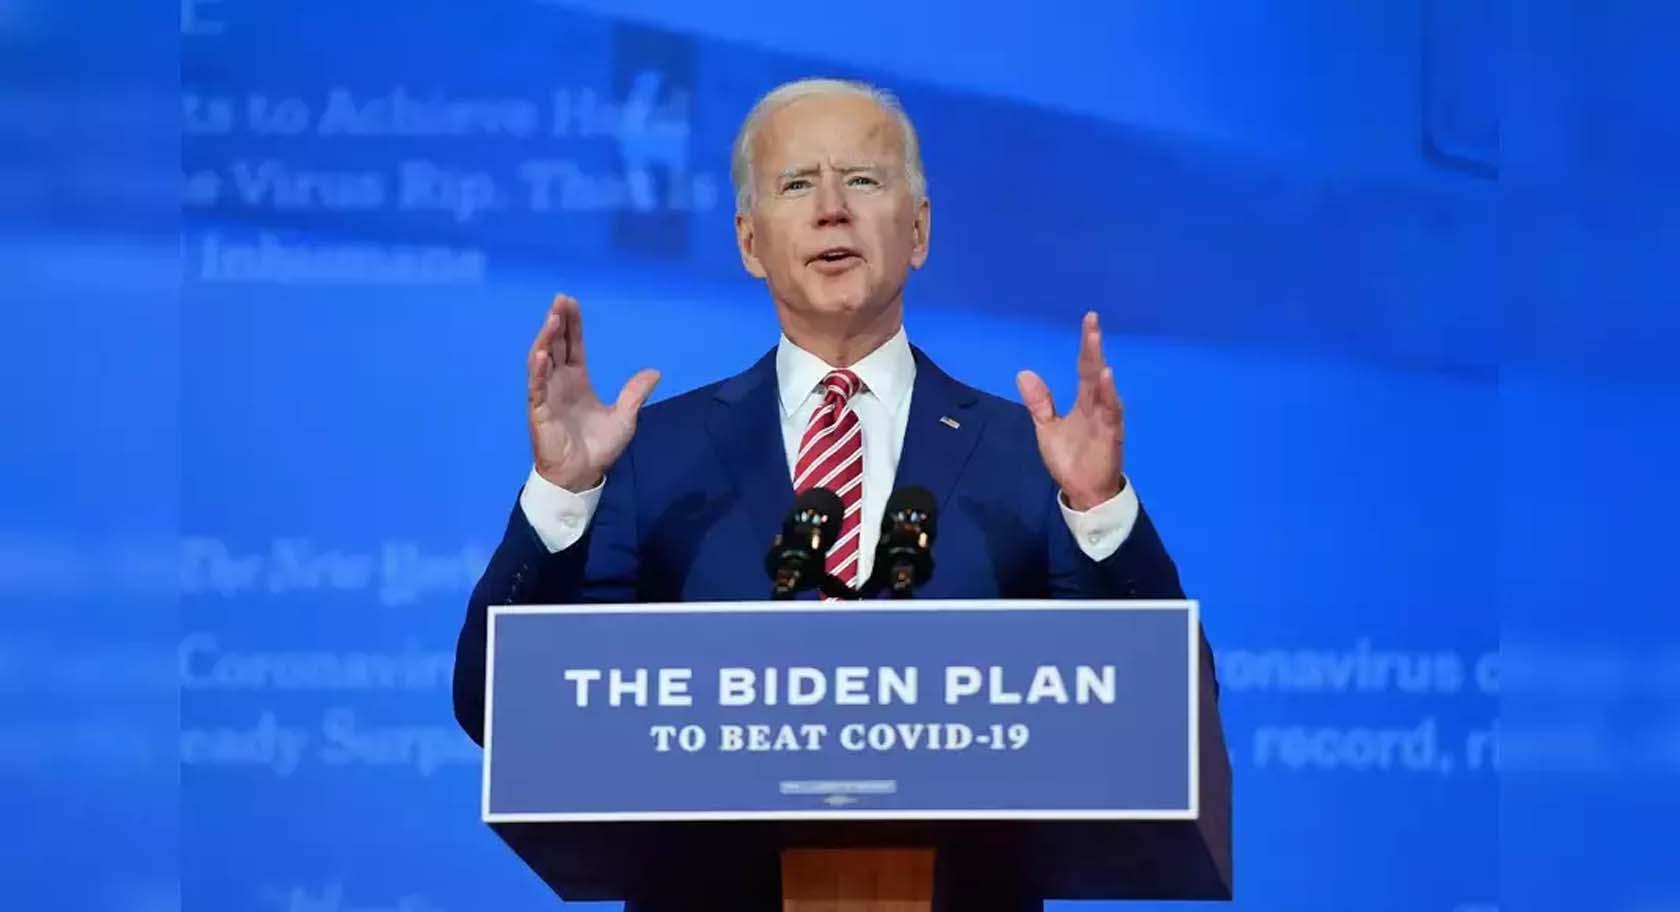 President Biden Has Assured Americans To Tackle Coronavirus Pandemic